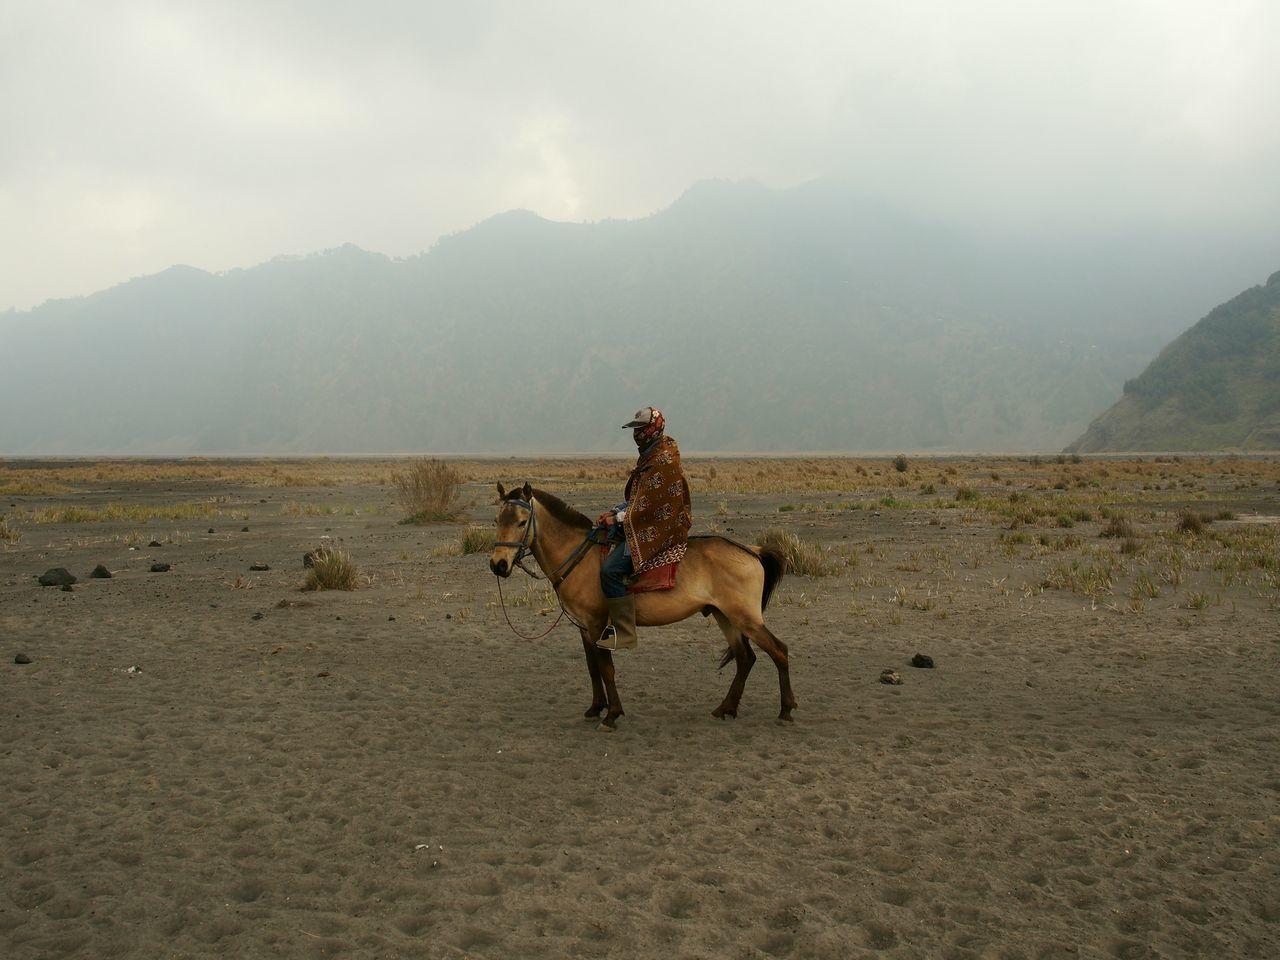 horse, domestic animals, working animal, animal themes, mountain, mammal, sky, nature, day, fog, landscape, transportation, outdoors, mountain range, sand, livestock, no people